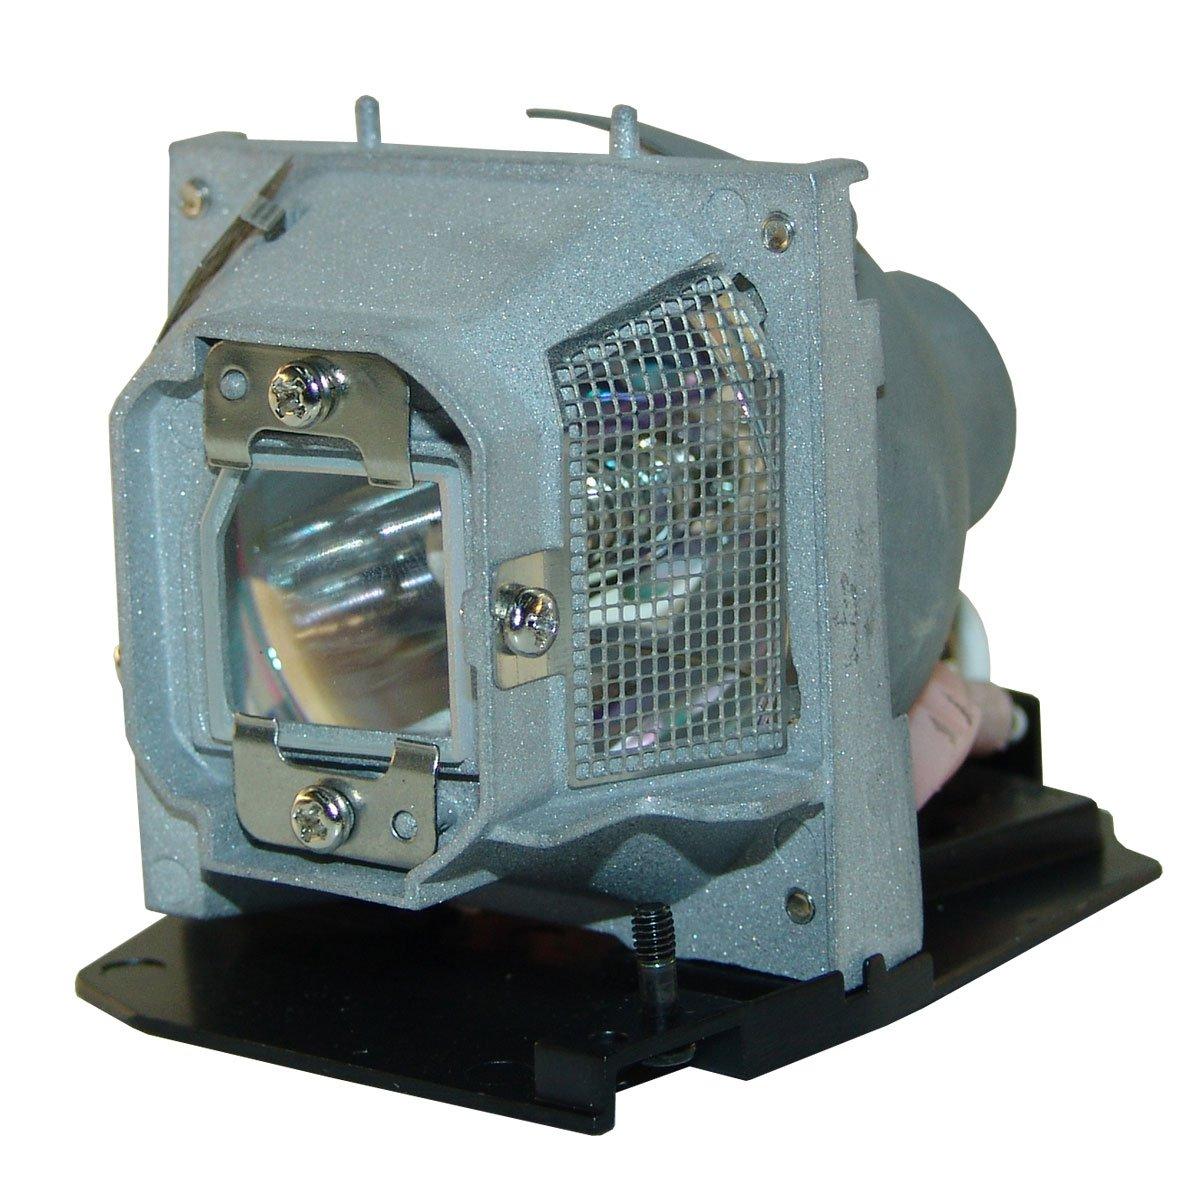 Lutema OEM 交換用ランプ ハウジング/電球付き Dell 310-6747用 Economy Economy Lamp with Housing B07KT8CJRN